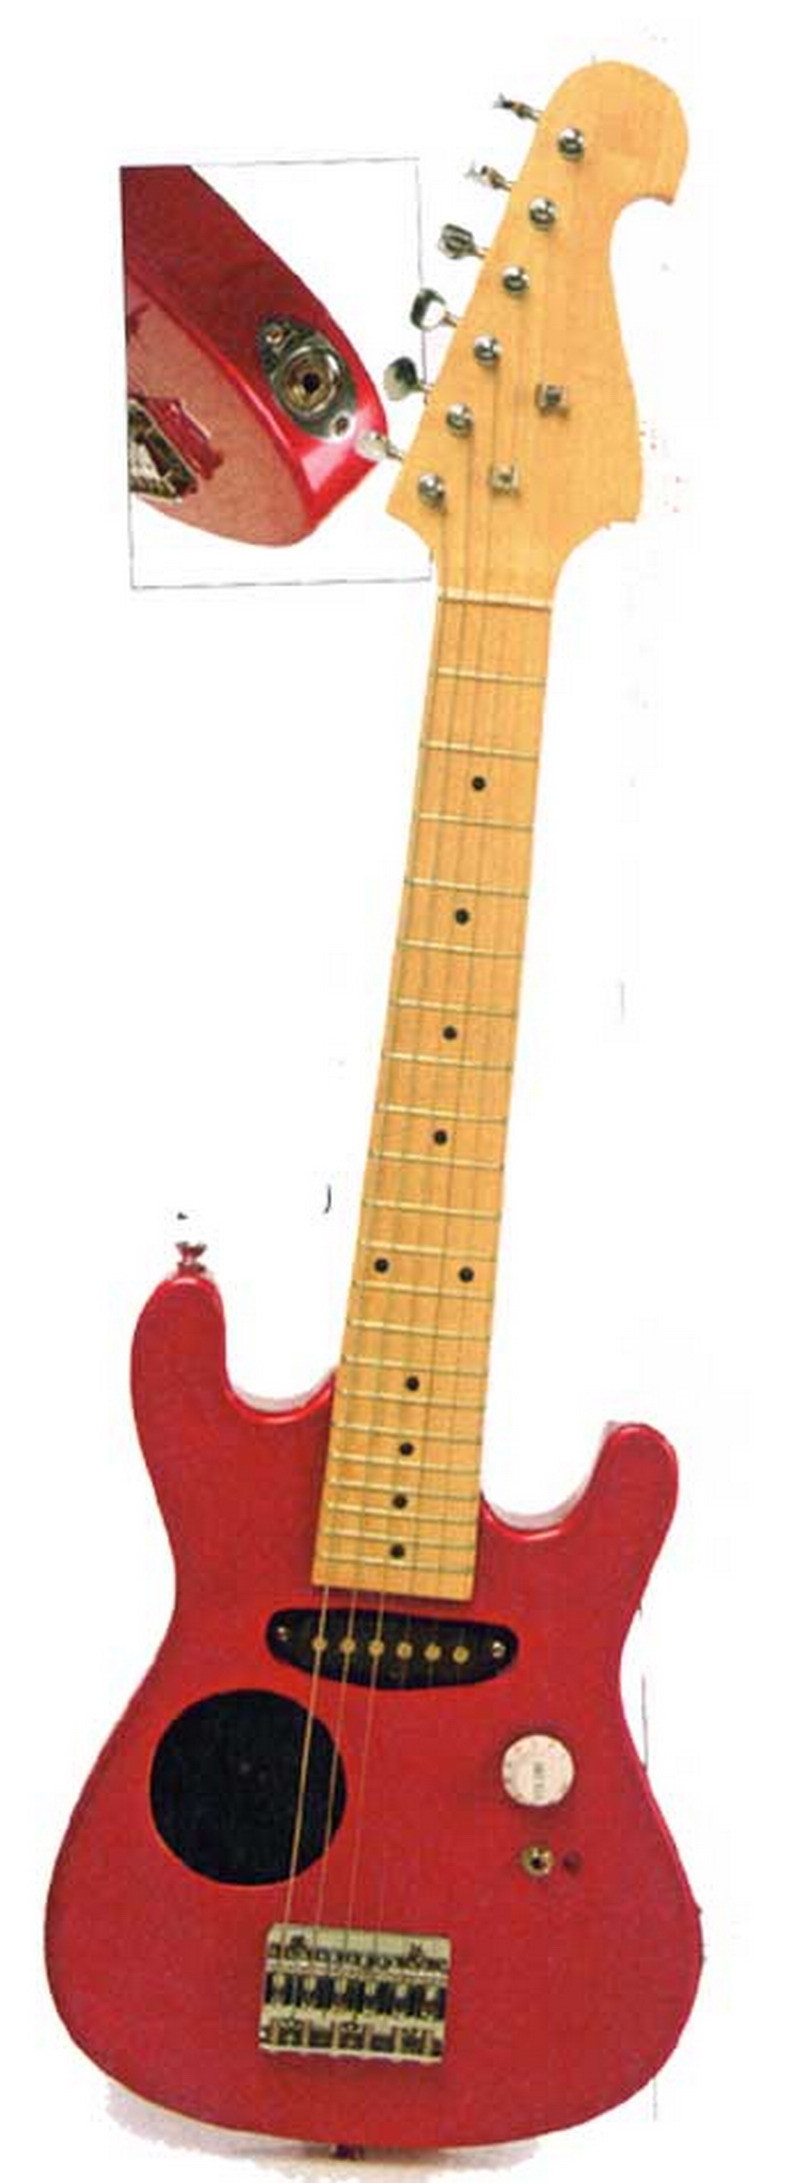 30 Electric Guitar : china 30 inch toy electric guitar tleg30amp 2 china toy electric guitar electric guitar ~ Vivirlamusica.com Haus und Dekorationen